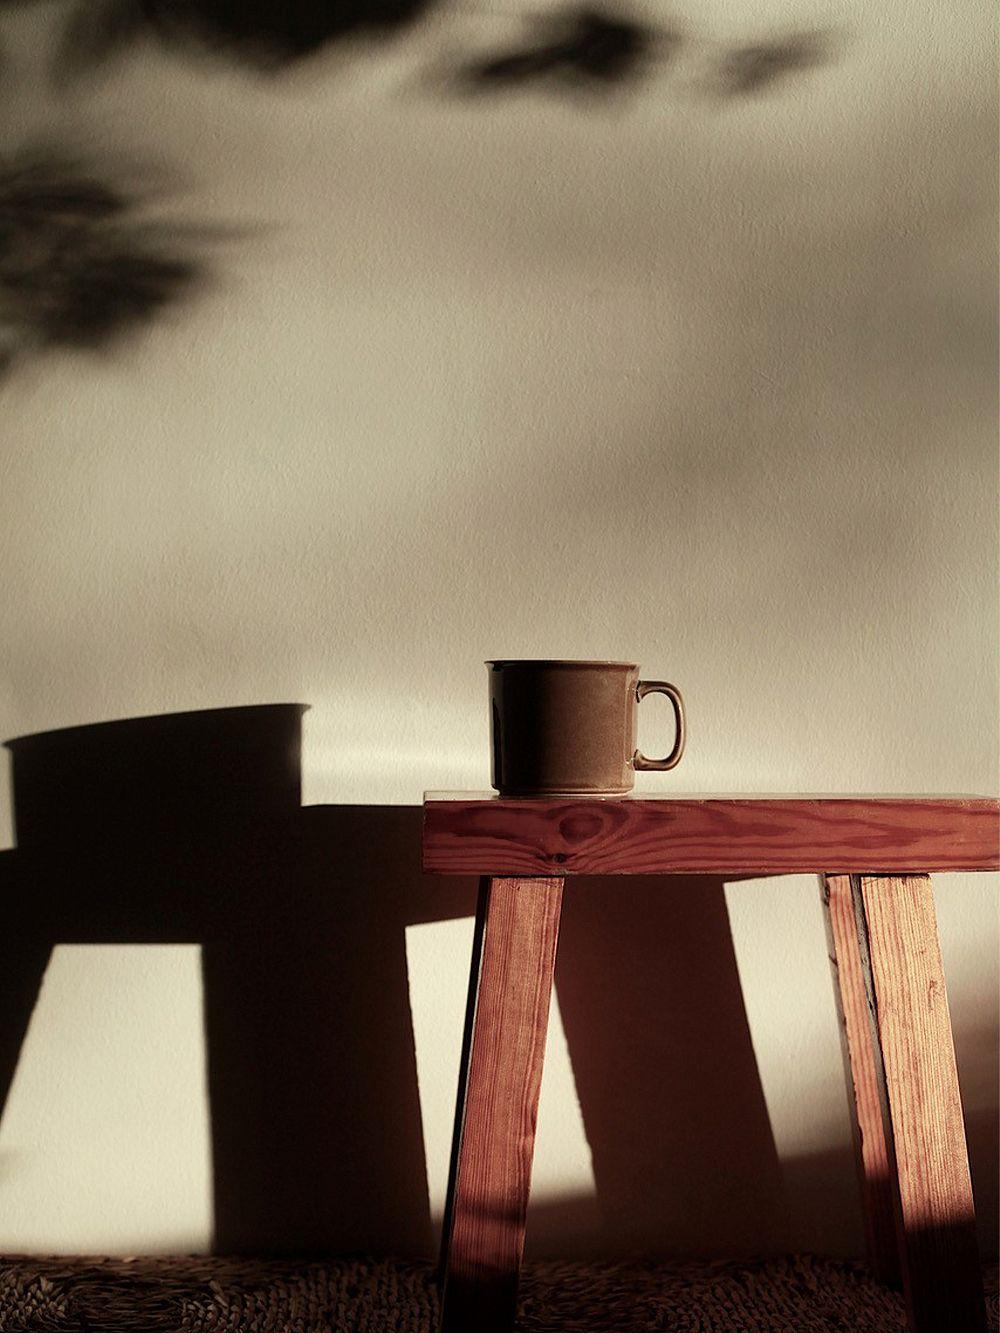 Creating tranquility in a summer idyll | Hanna-Katariina Mononen